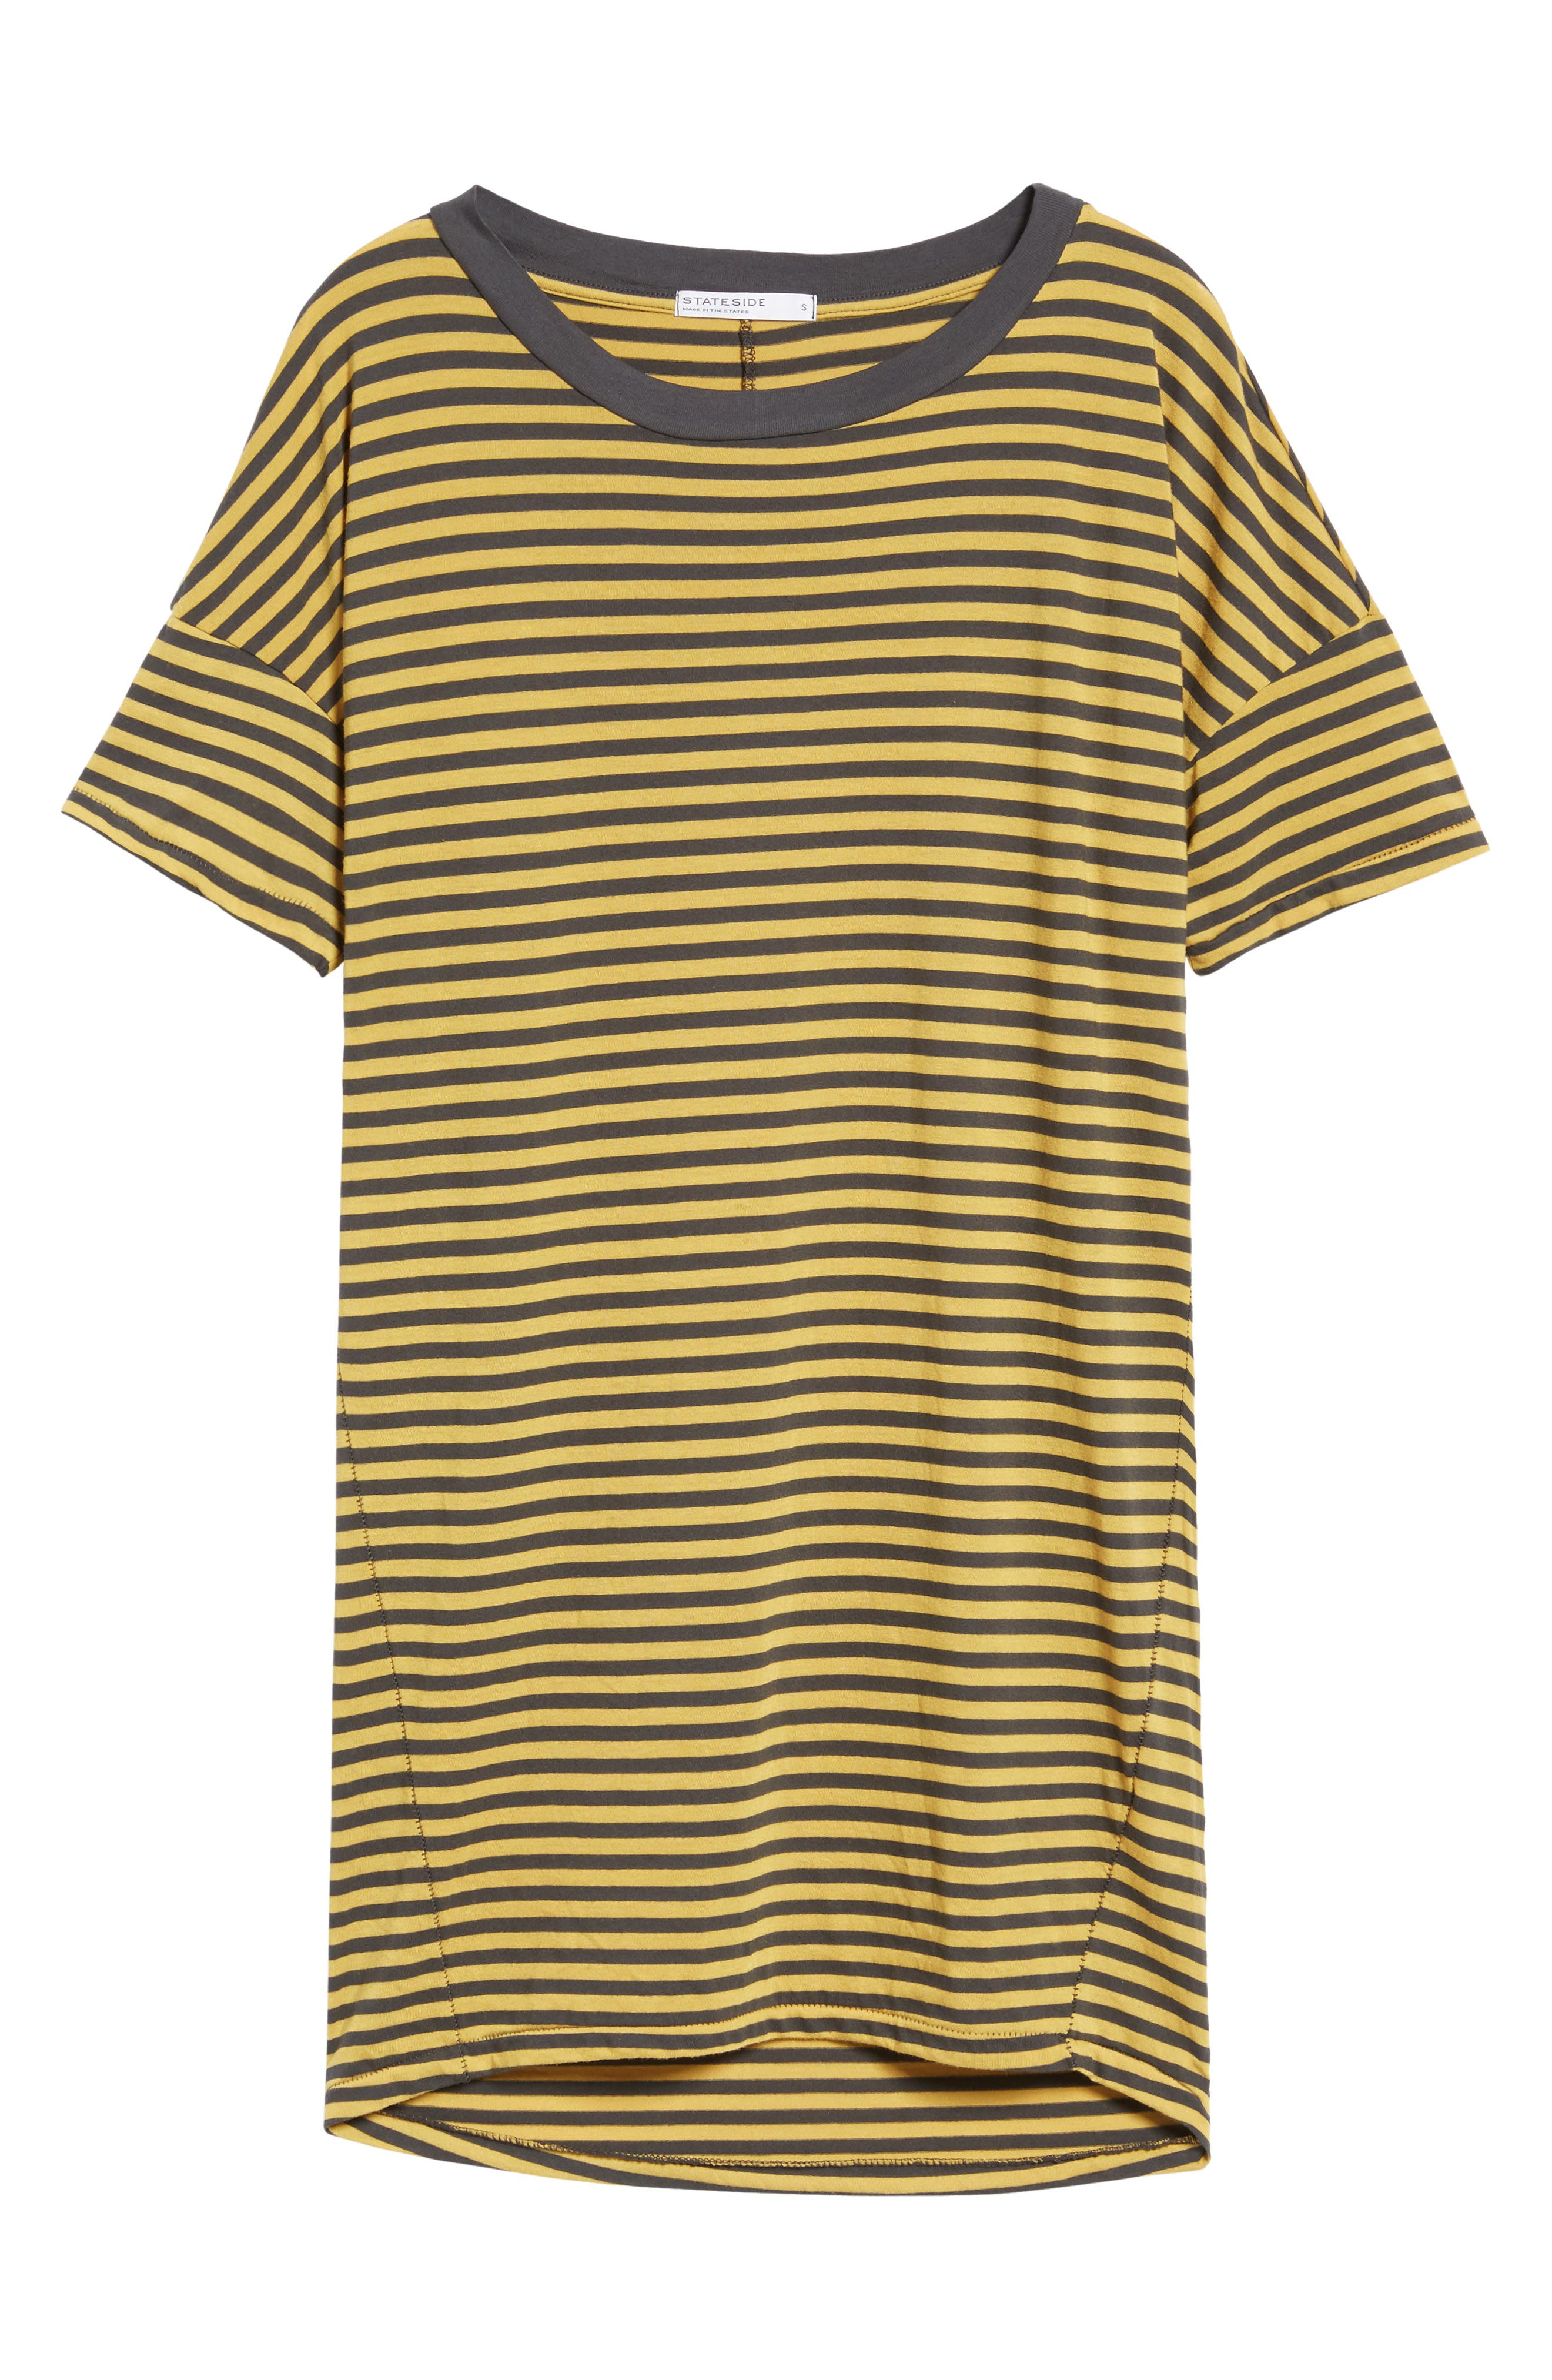 Mustard Stripe T-Shirt Dress,                             Alternate thumbnail 6, color,                             020